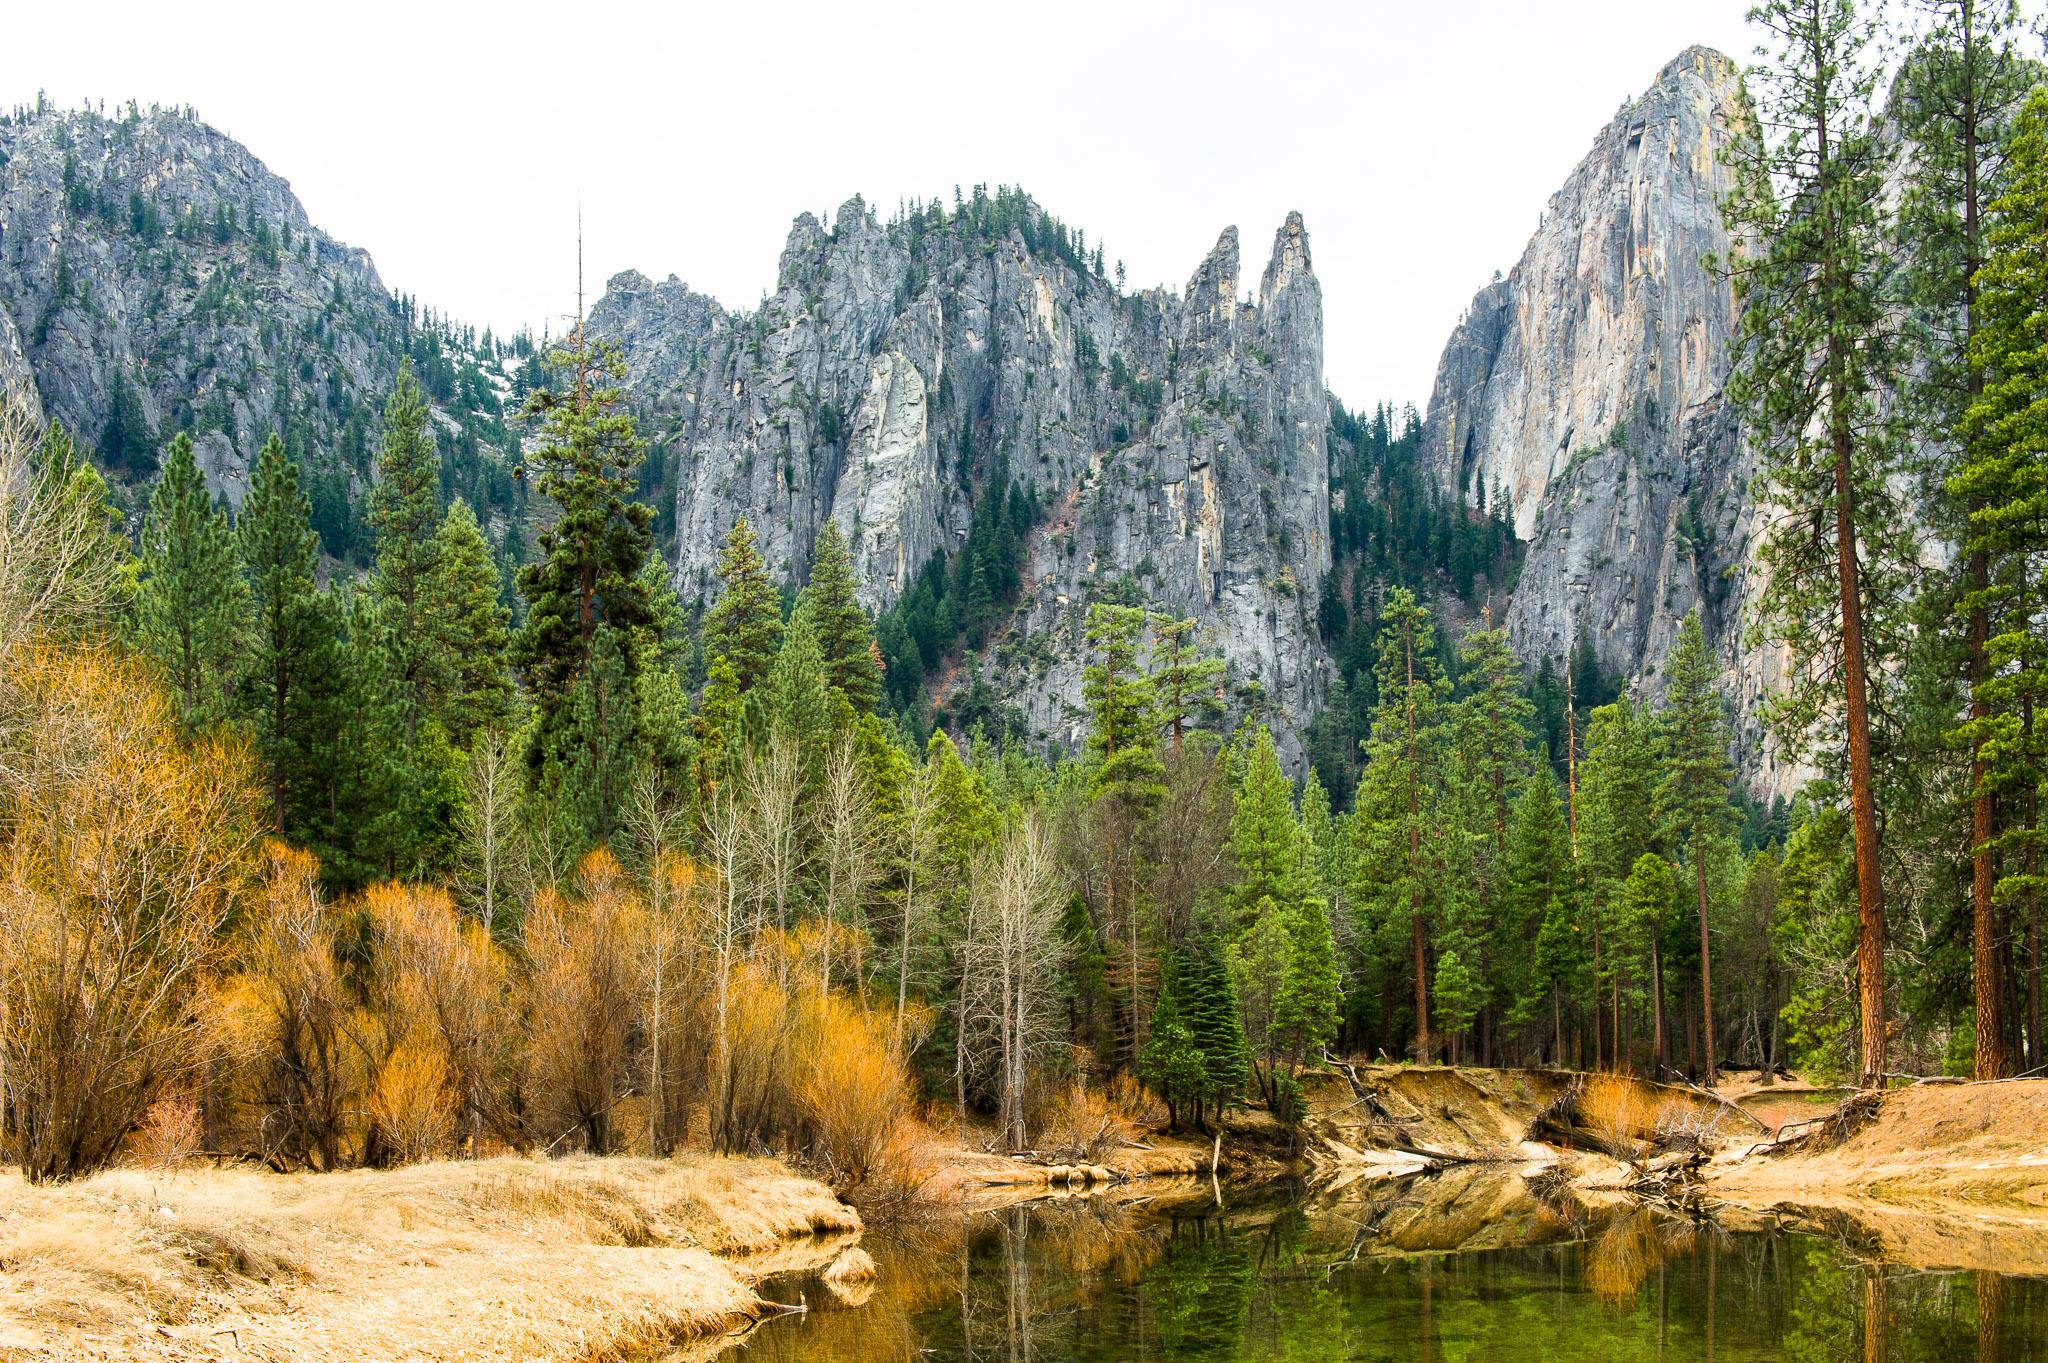 Jason-Davis-Images-Yosemite-0026.jpg